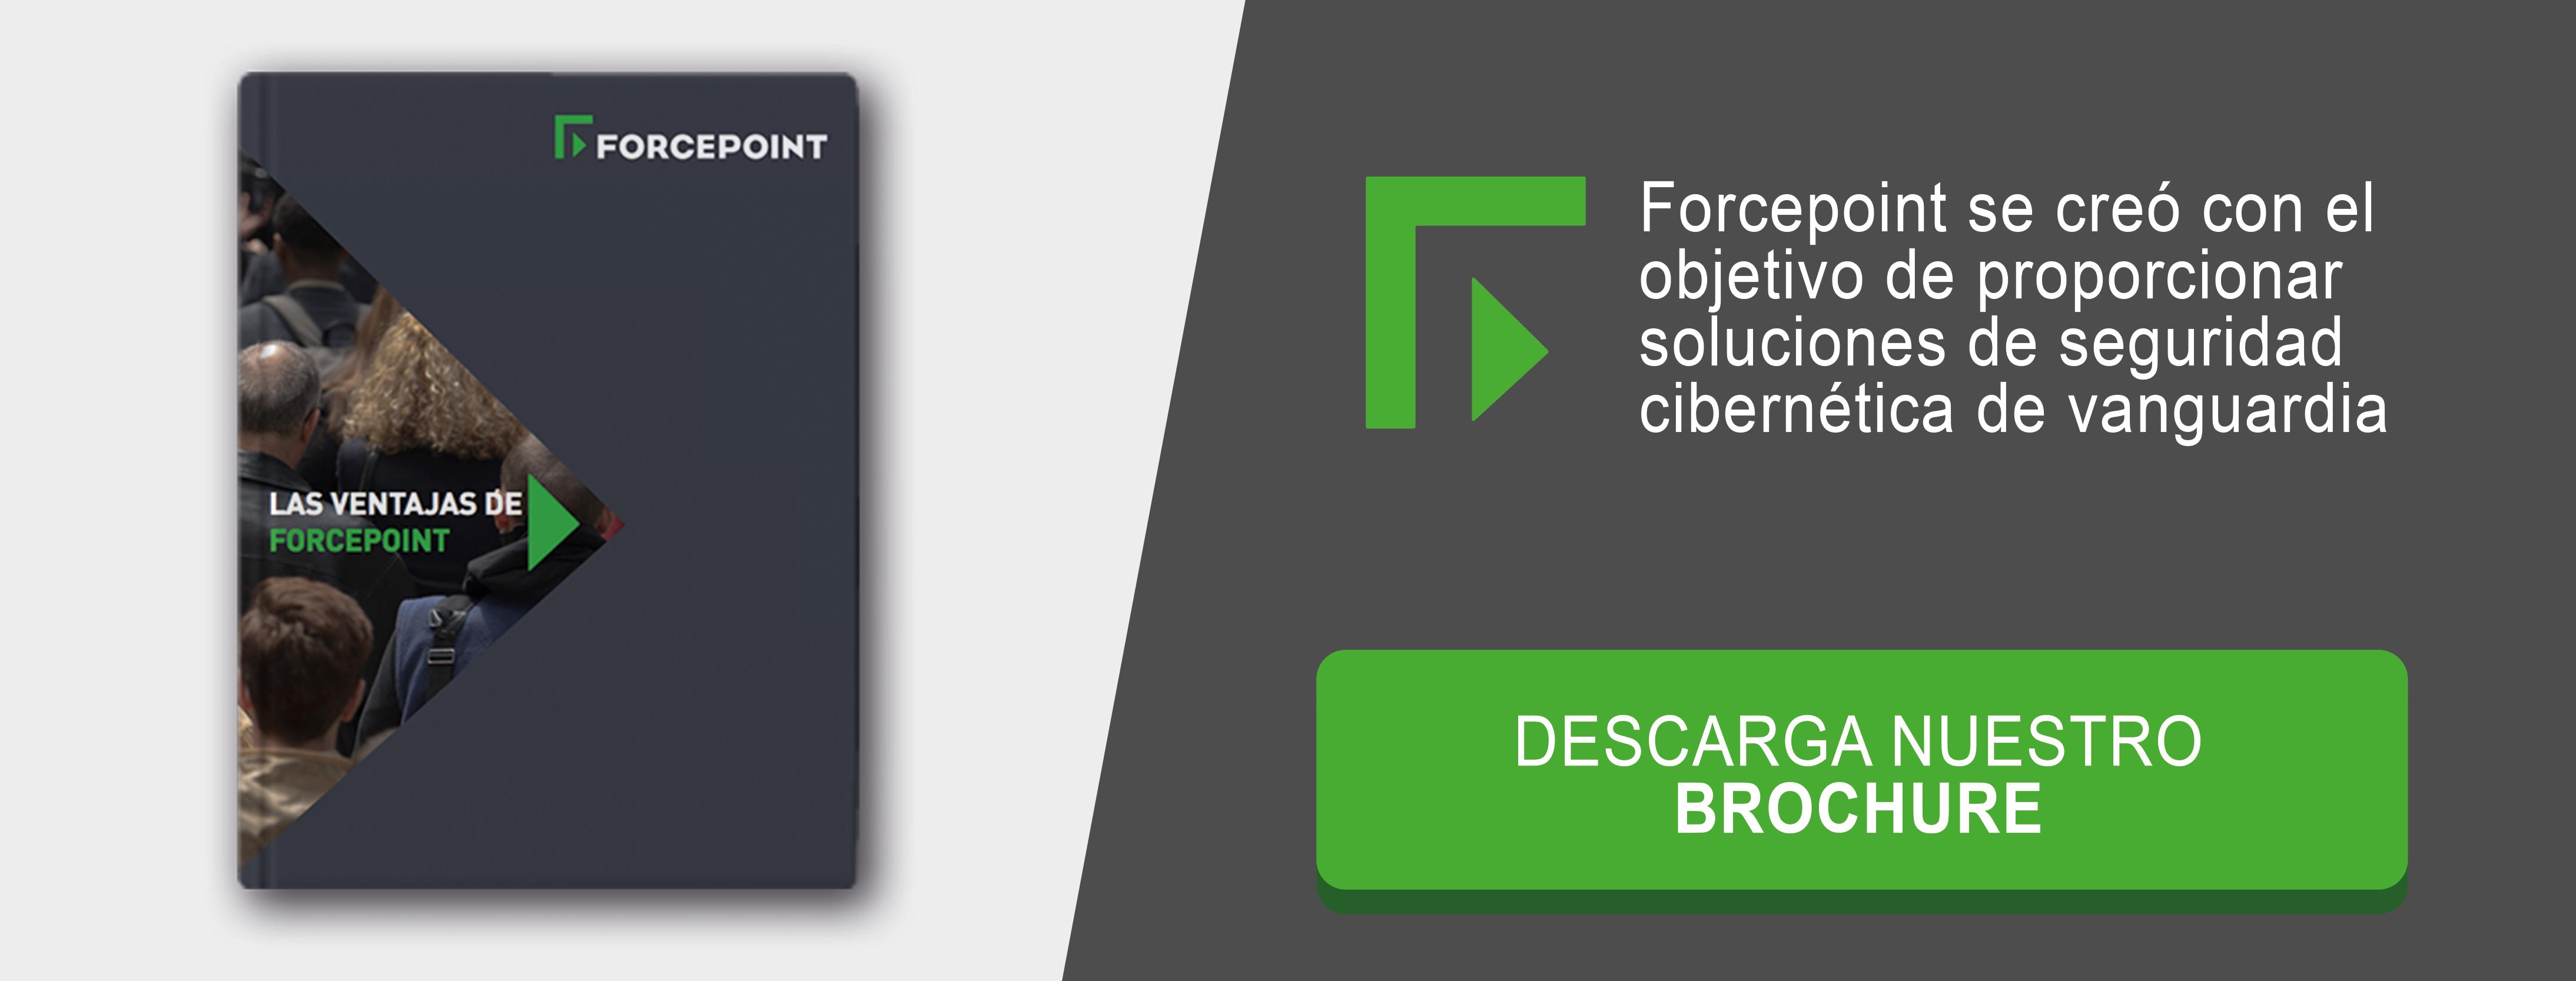 Forcepoint - Descarga de brochure corportativo en español